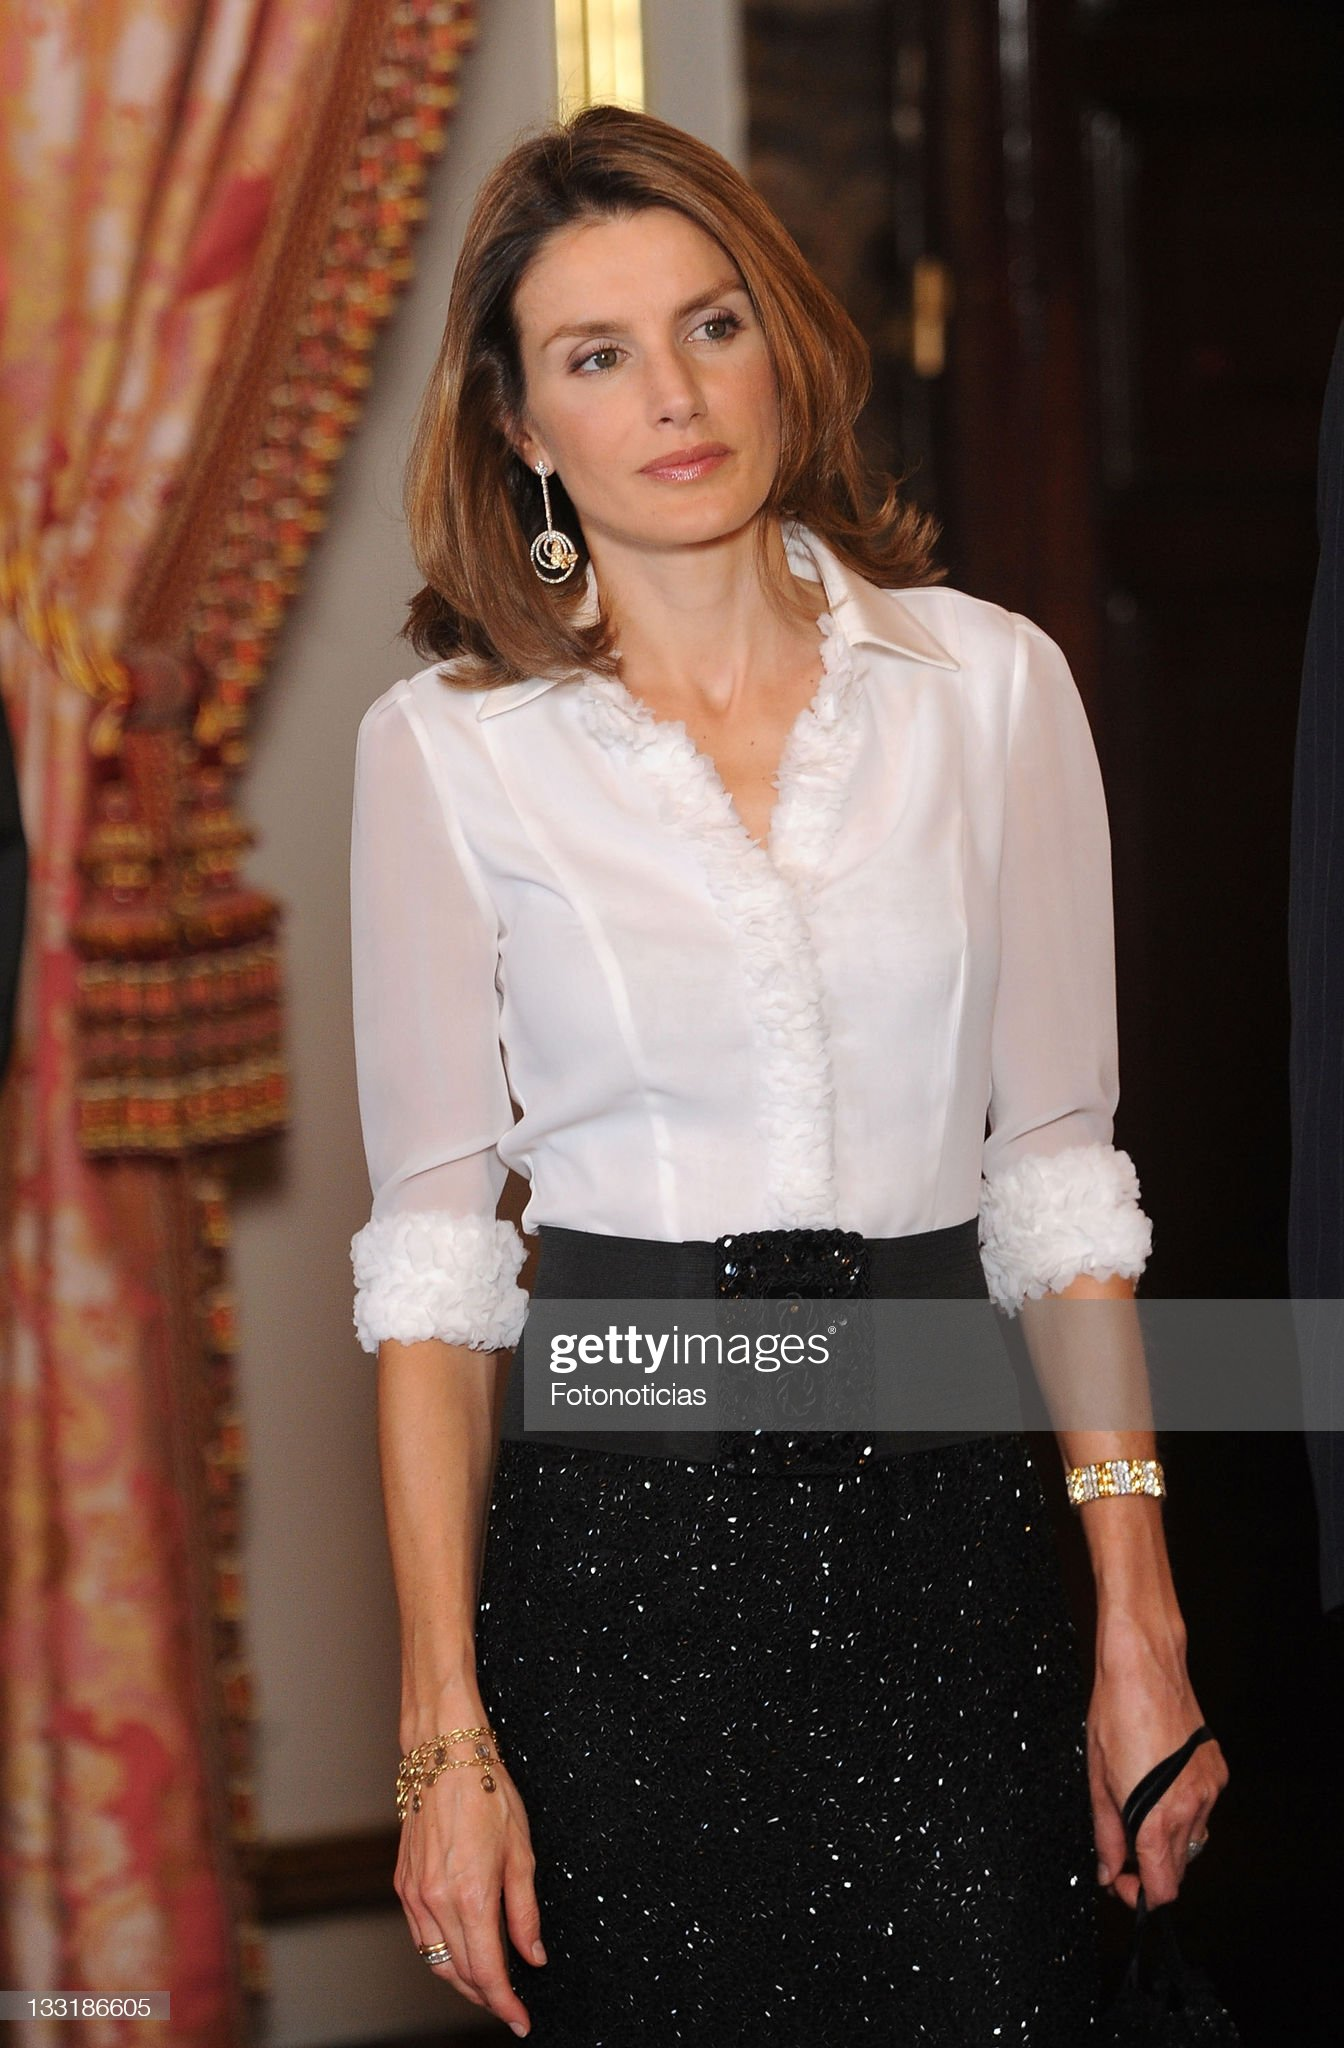 Вечерние наряды Королевы Летиции Spanish Royals Host Gala Dinner Honoring Costa Rica President : News Photo